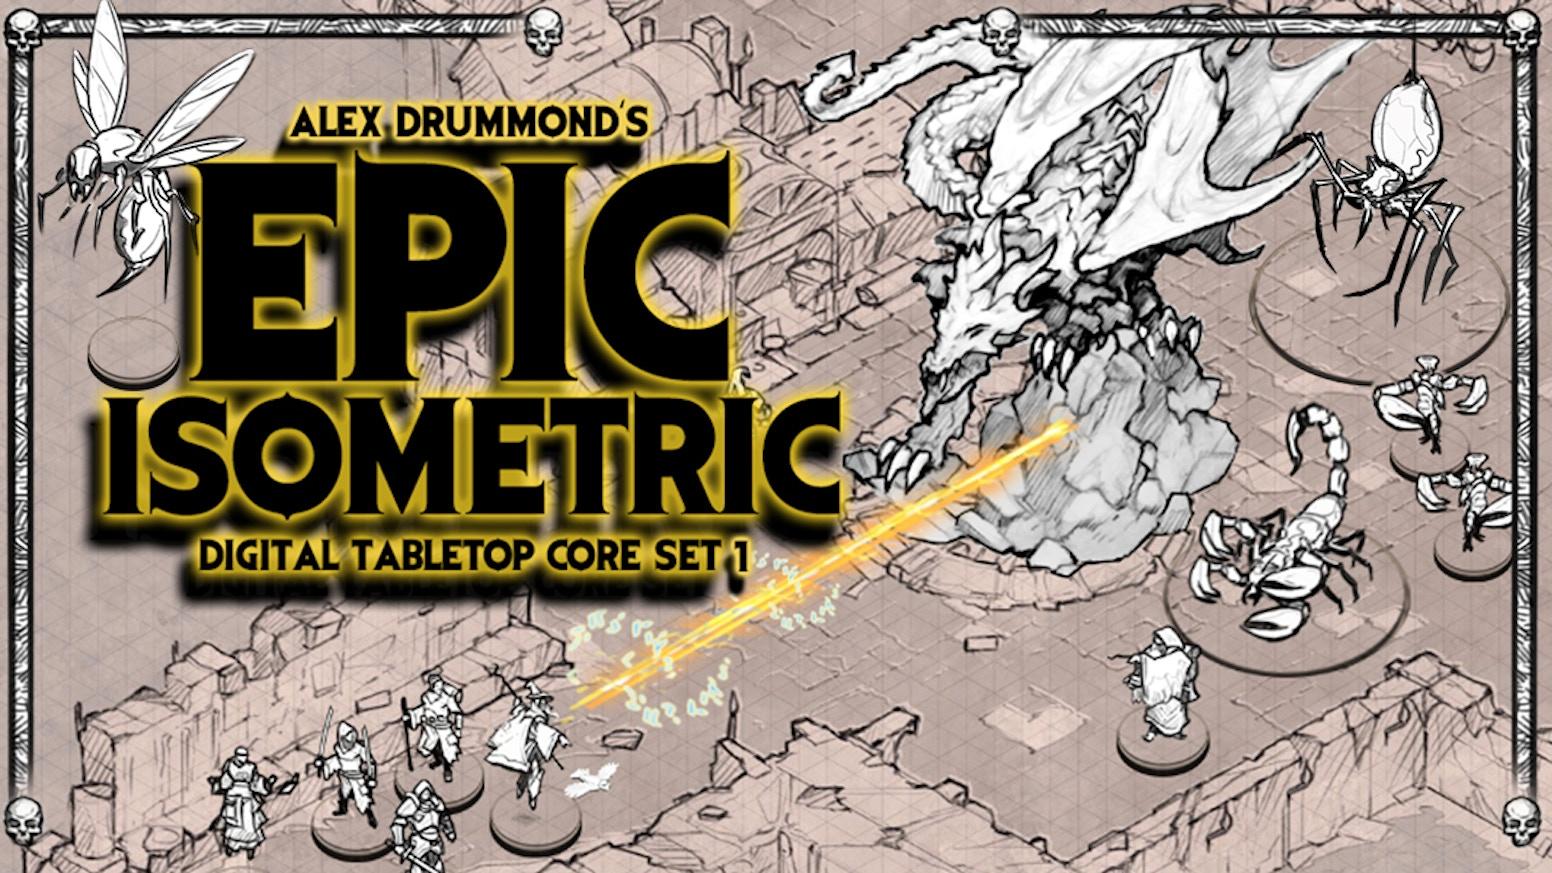 Epic digital tabletop art core set  by Alex Drummond — Kickstarter